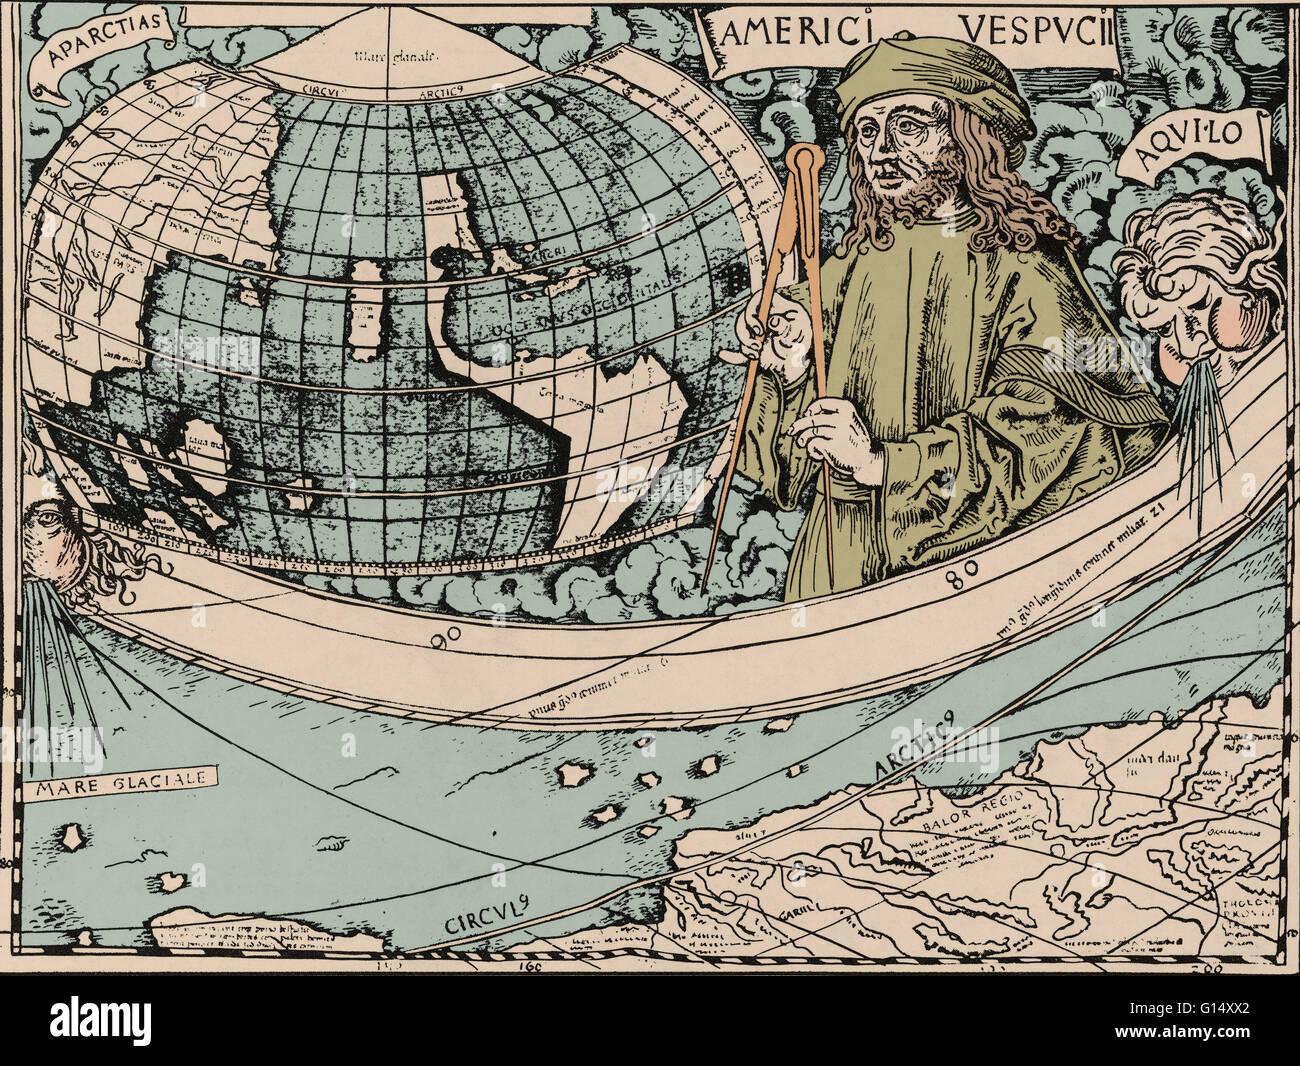 Vespucci gazes at New World in a panel of 1507 map by Martin Waldseemuller.  Amerigo Vespucci (March 9, 1454 - February 22, 1512) was an Italian  explorer, ...